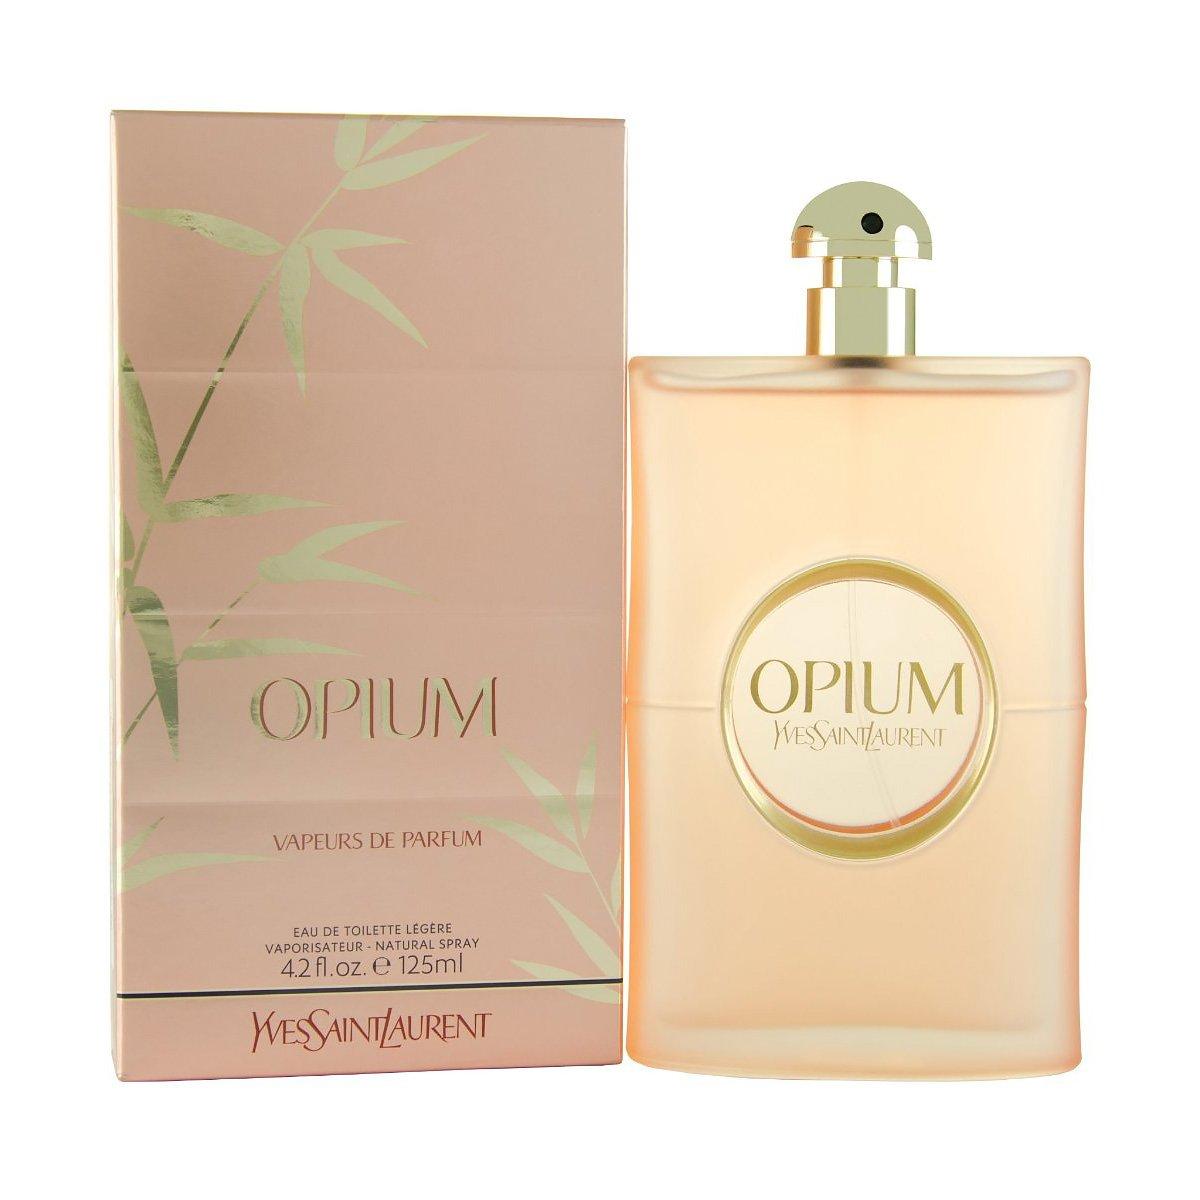 Laurent Parfum De Opium Vapeurs Yves Saint IEH9D2